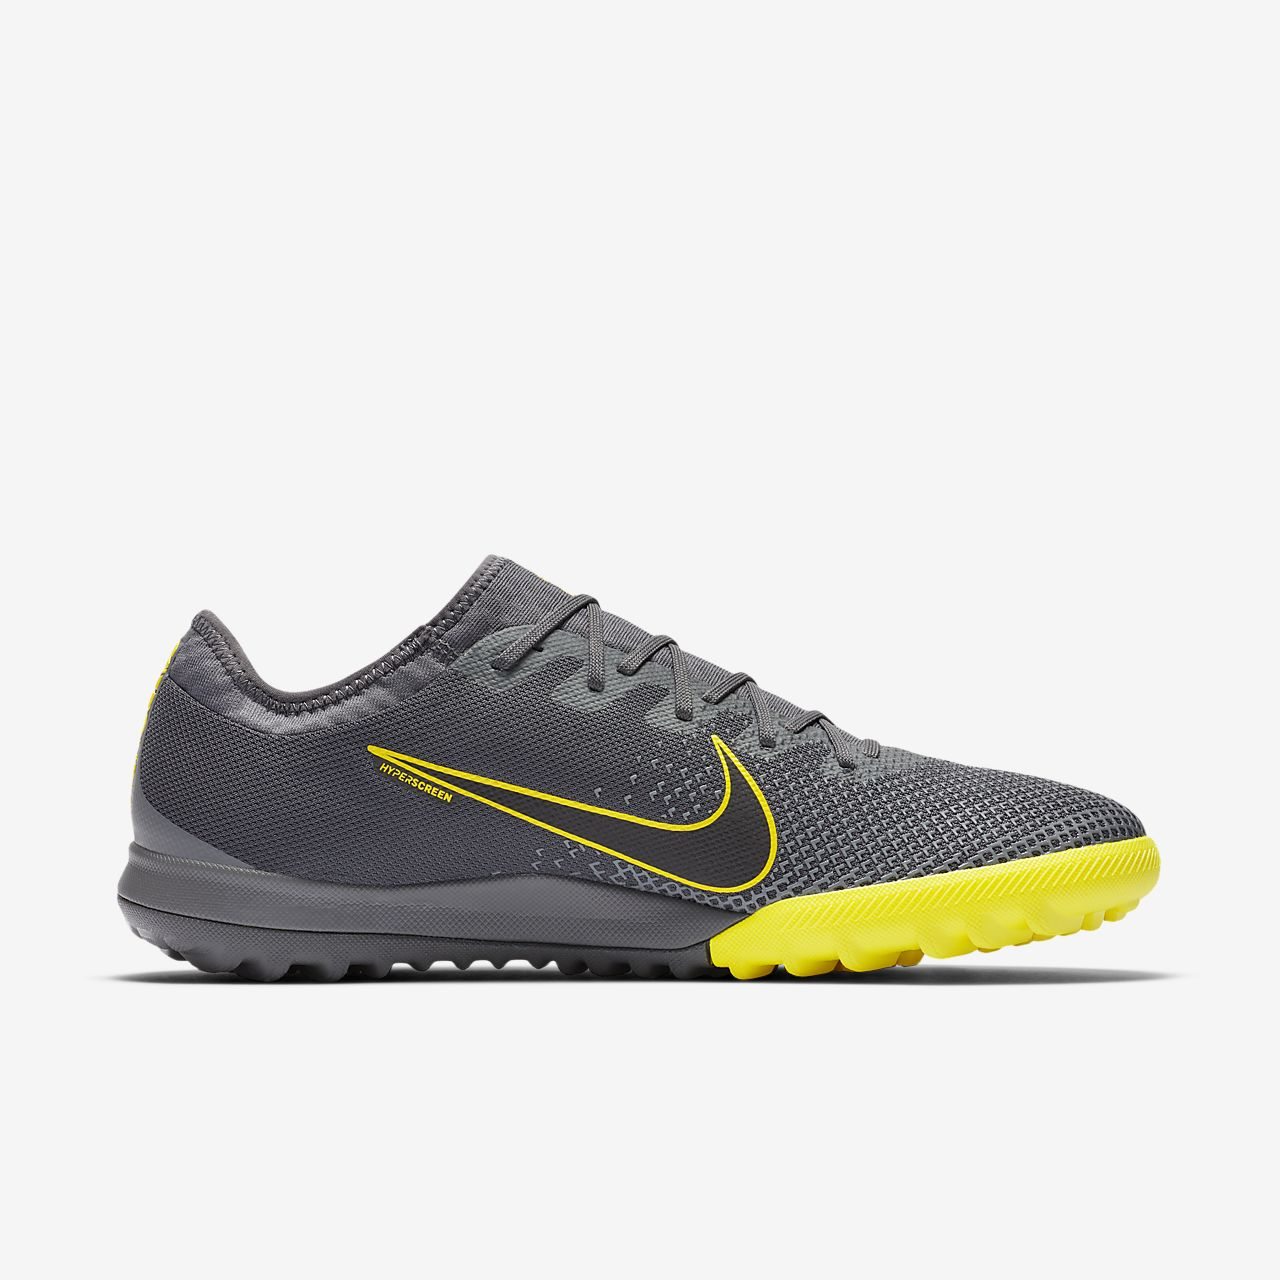 84c62a38c Nike MercurialX Vapor XII Pro TF Turf Football Shoe. Nike.com BE